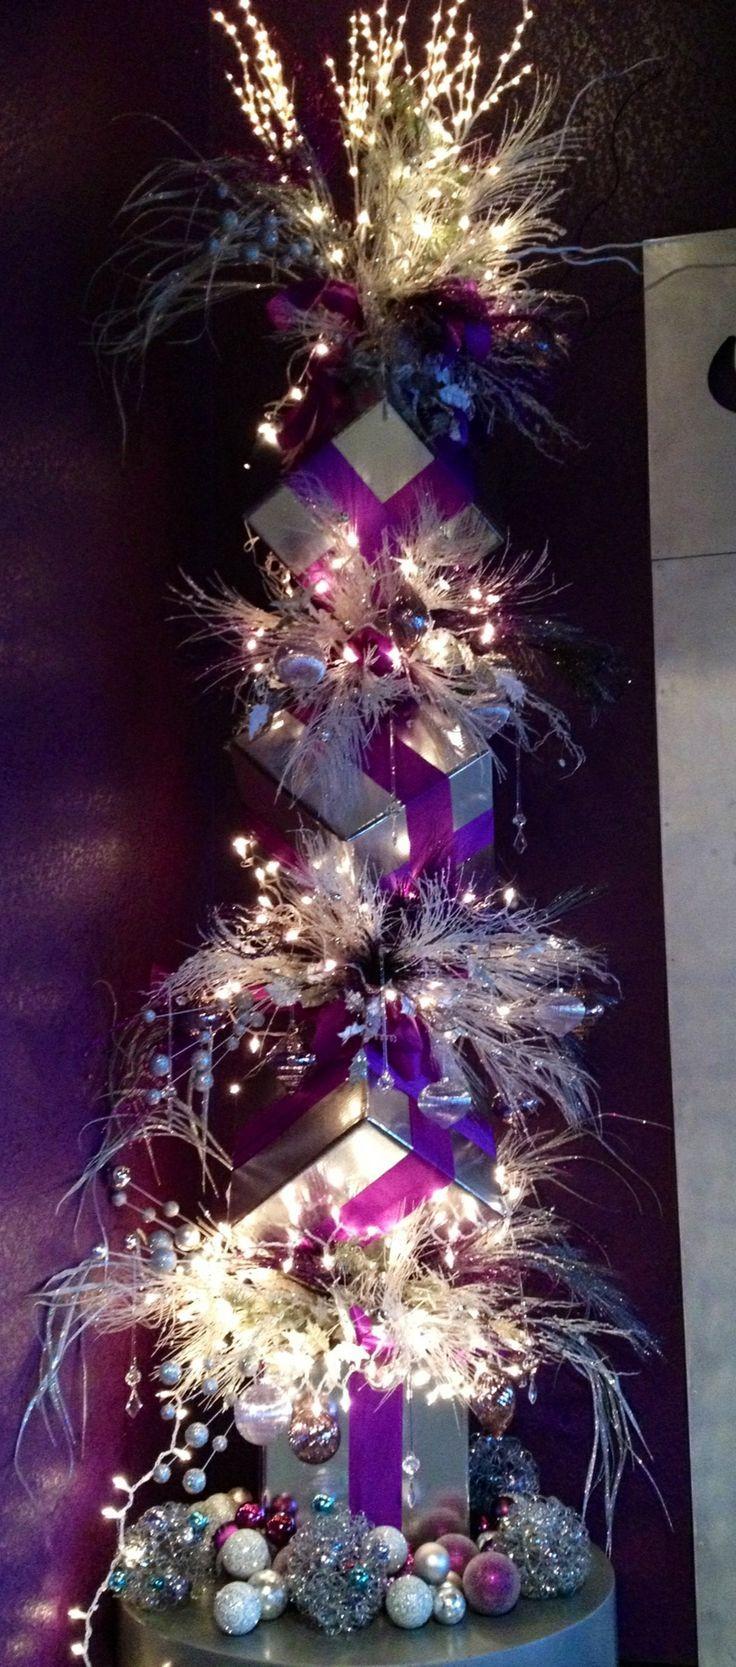 best 25 purple christmas ideas on pinterest purple christmas decorations ac moore and 99c. Black Bedroom Furniture Sets. Home Design Ideas